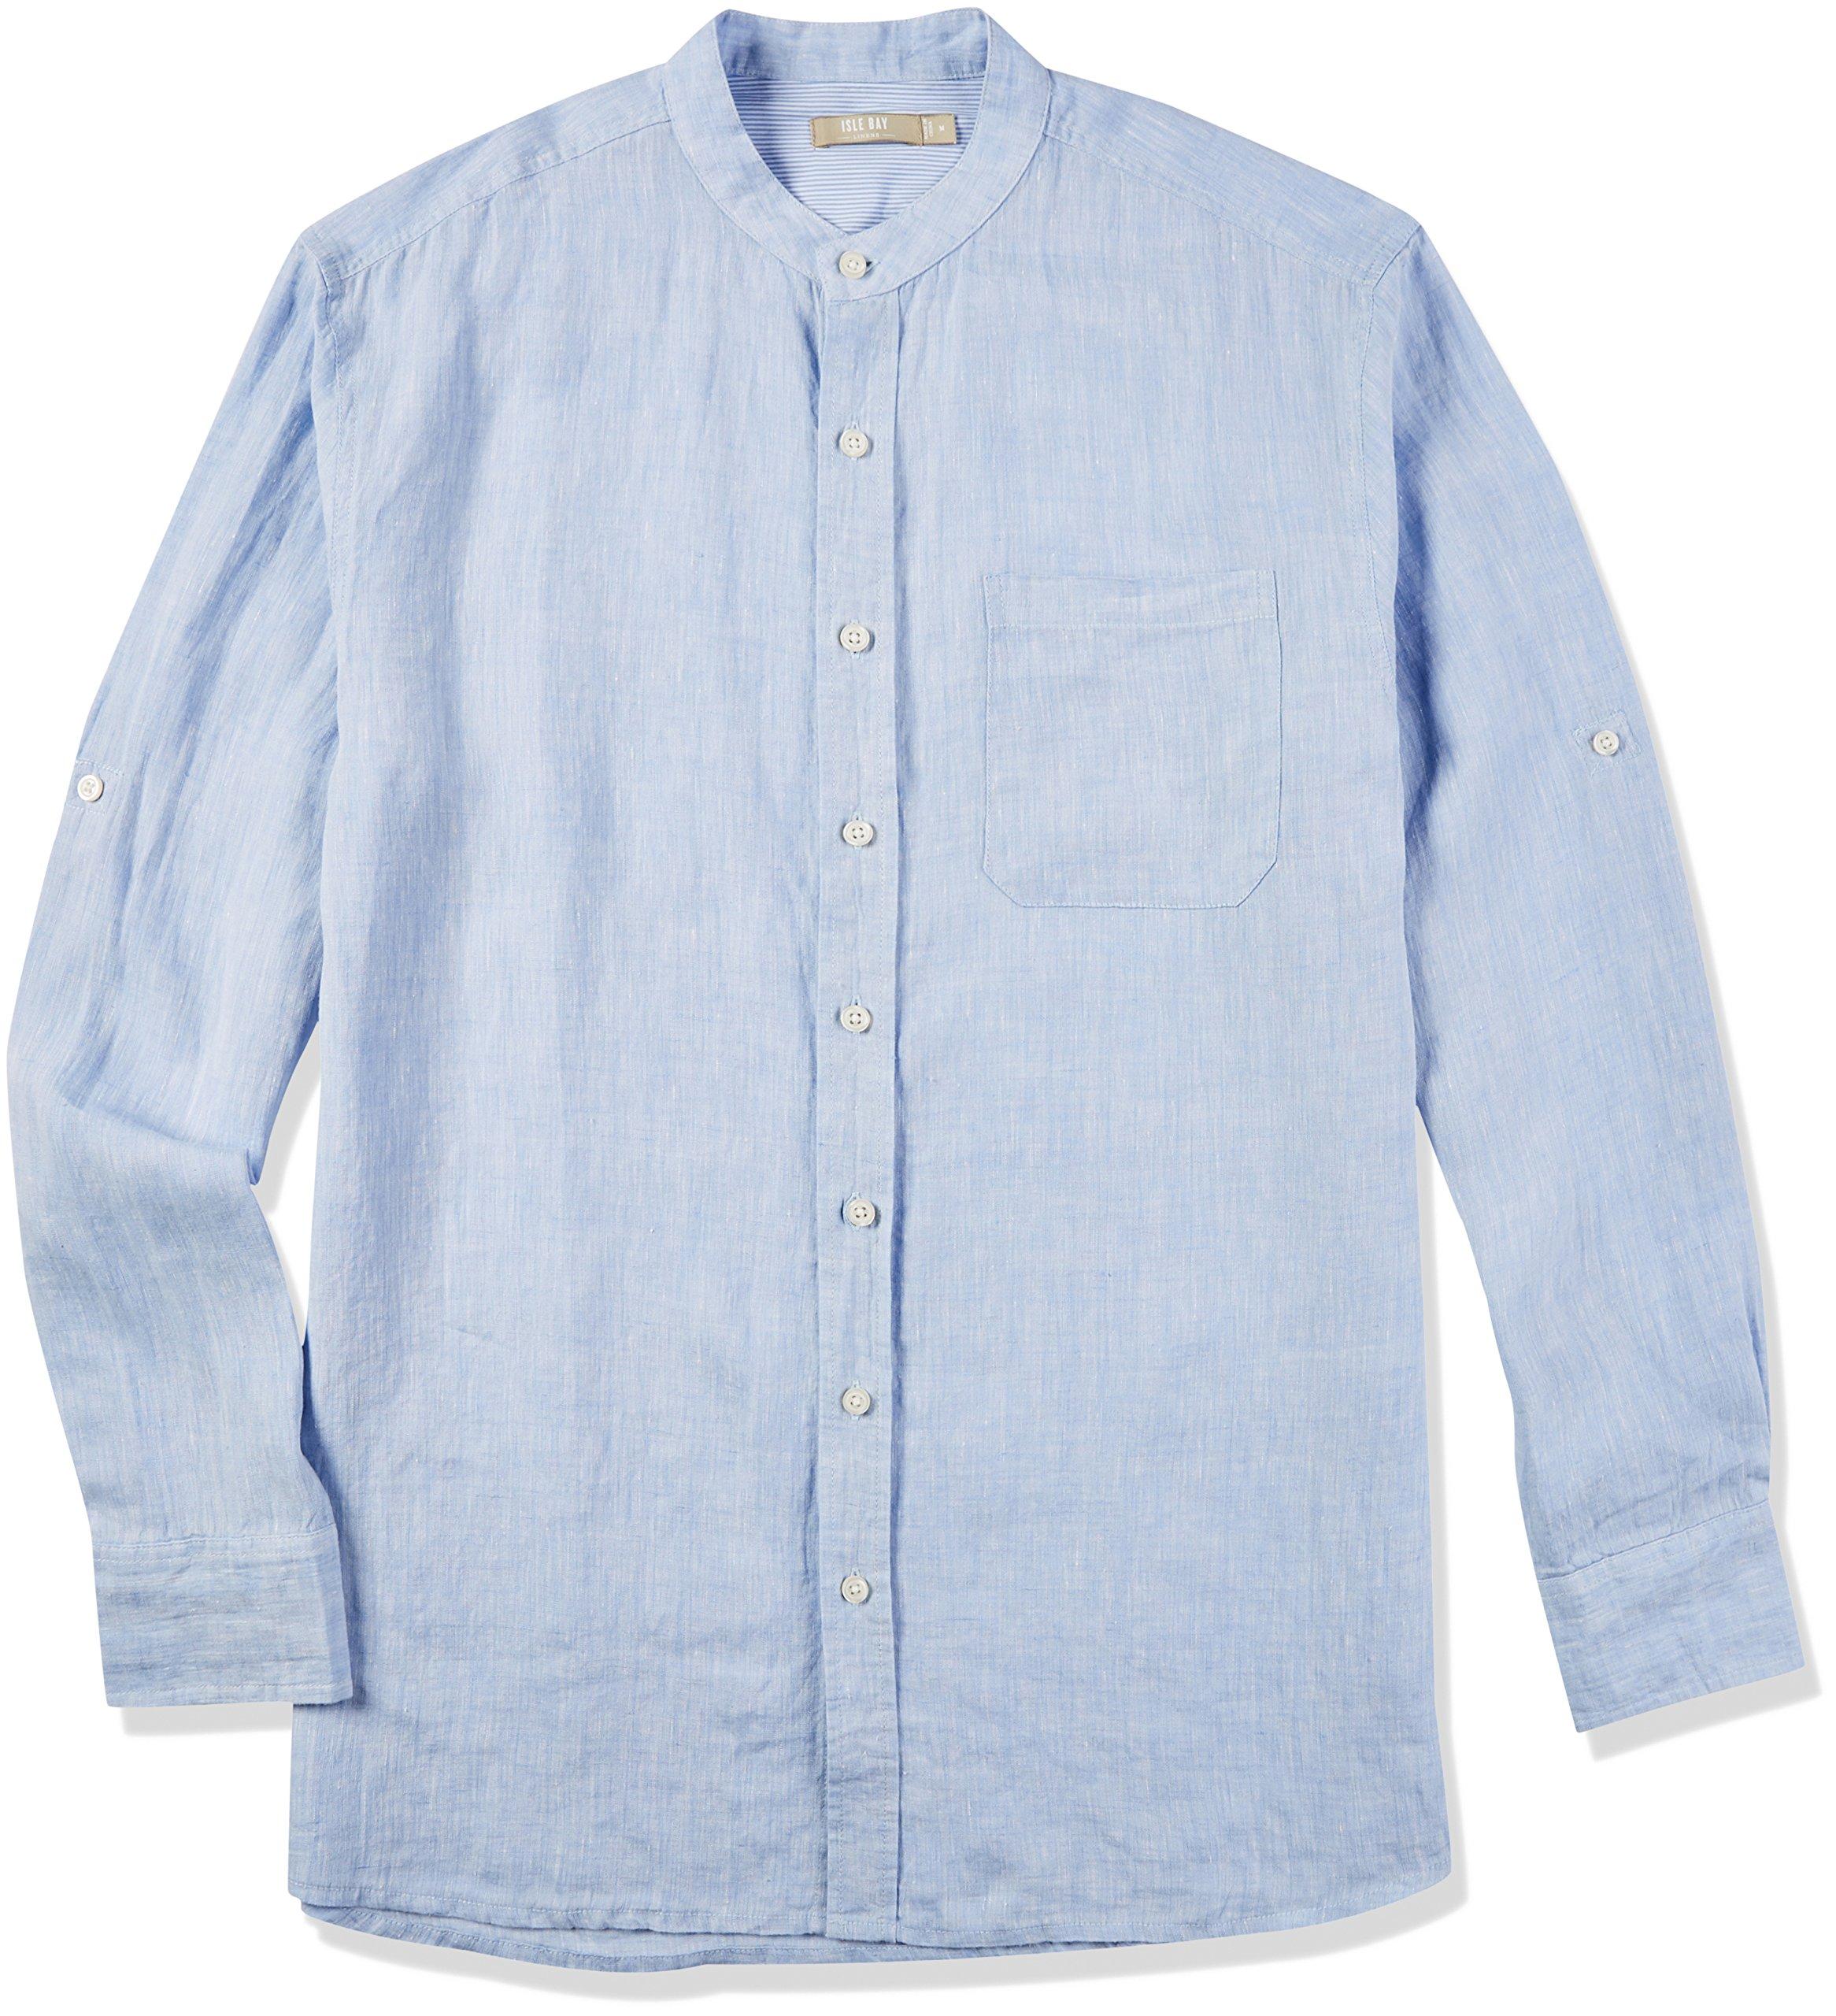 Isle Bay Linens Men's Standard-Fit 100% Linen Long-Sleeve Band Collar Woven Shirt Mid-Blue XX-Large